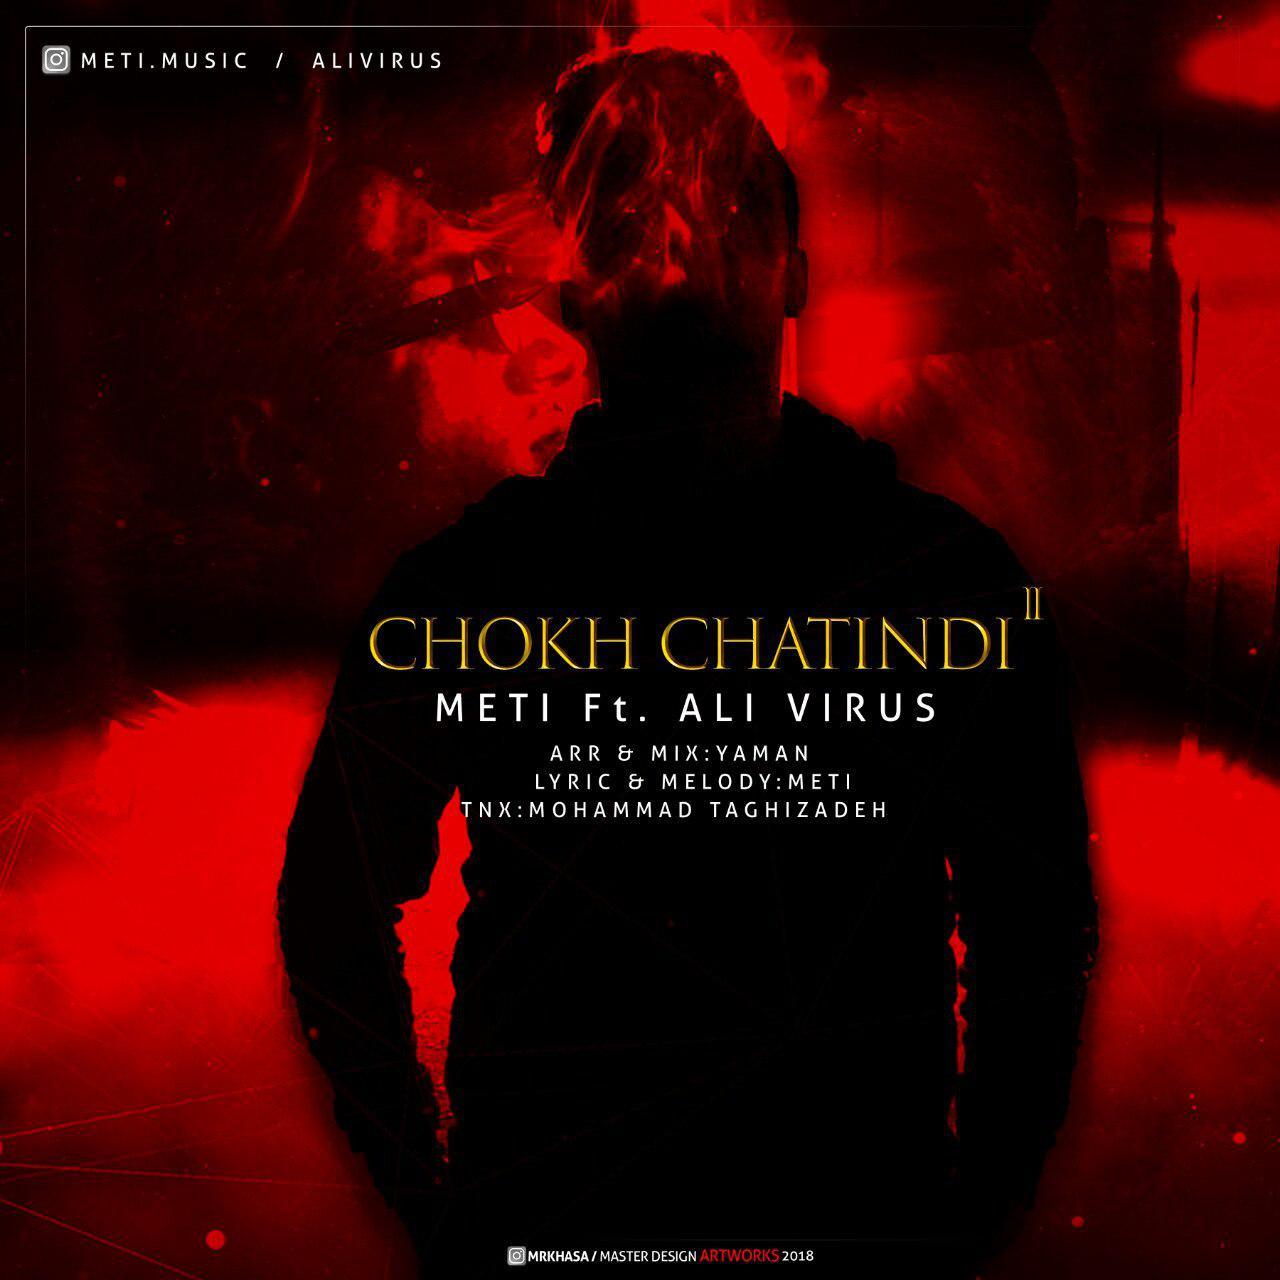 http://s9.picofile.com/file/8335209700/38Meti_Ft_Ali_Virus_Chokh_Chatindi_2.jpg